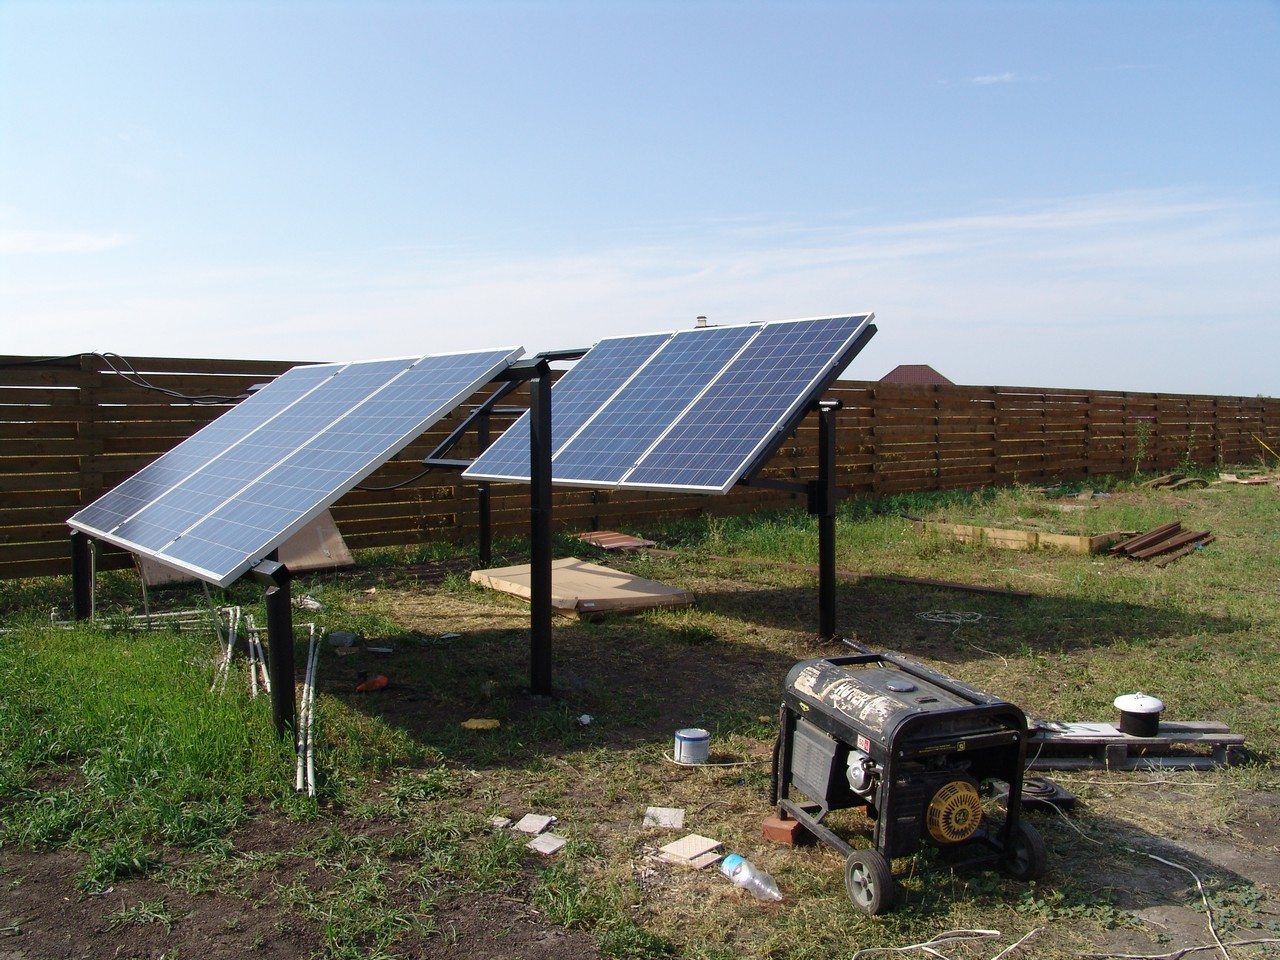 солнечные батареи 300 ватт 24В Поли